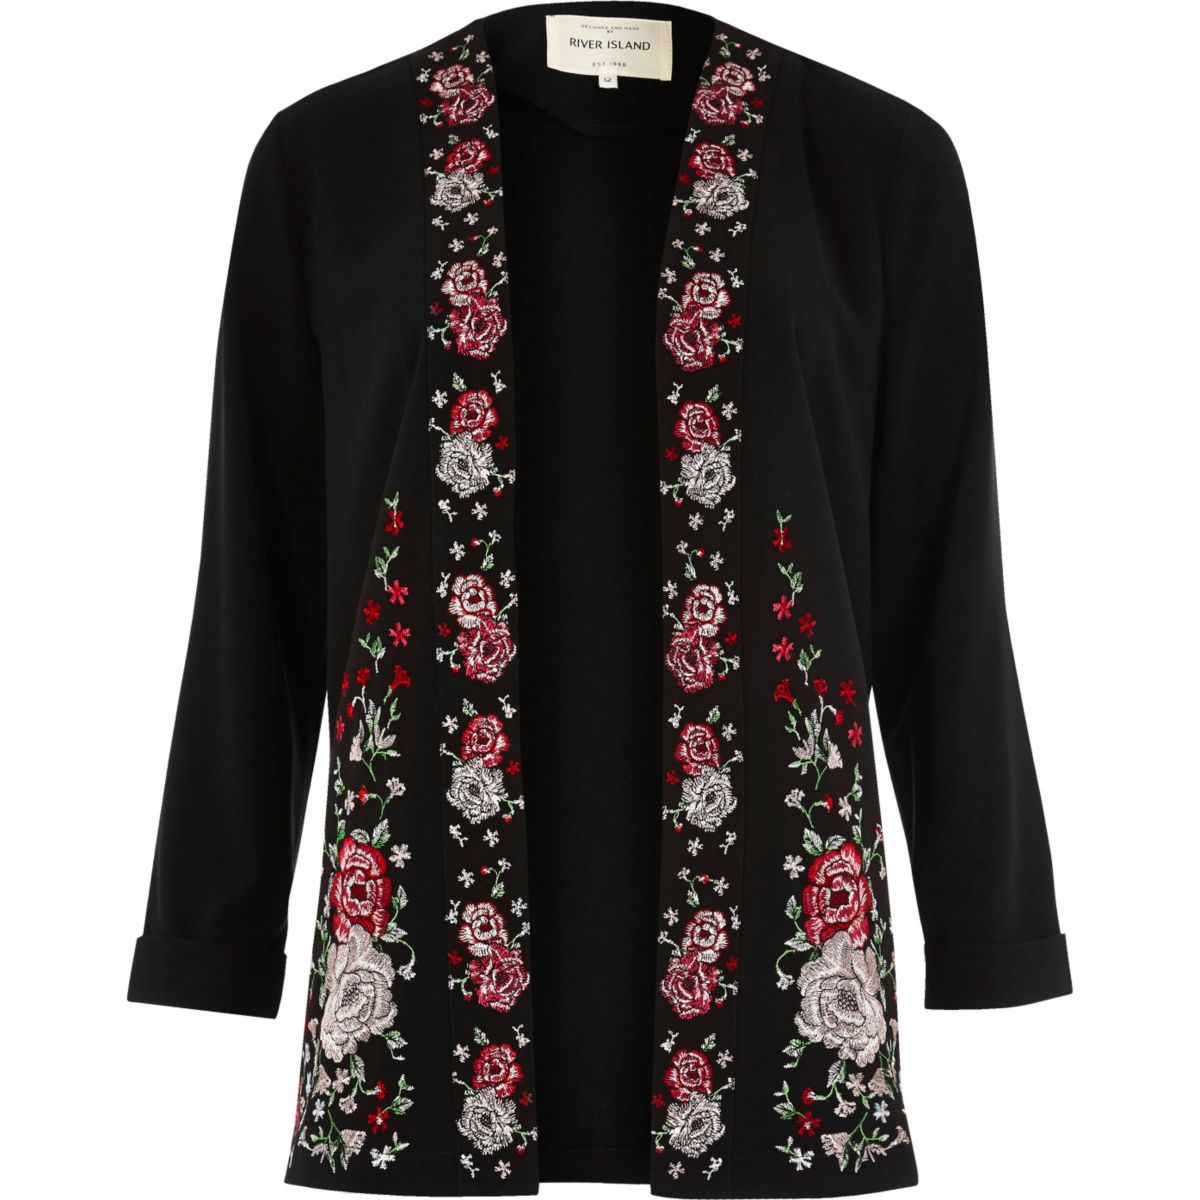 Black floral embroidered duster coat